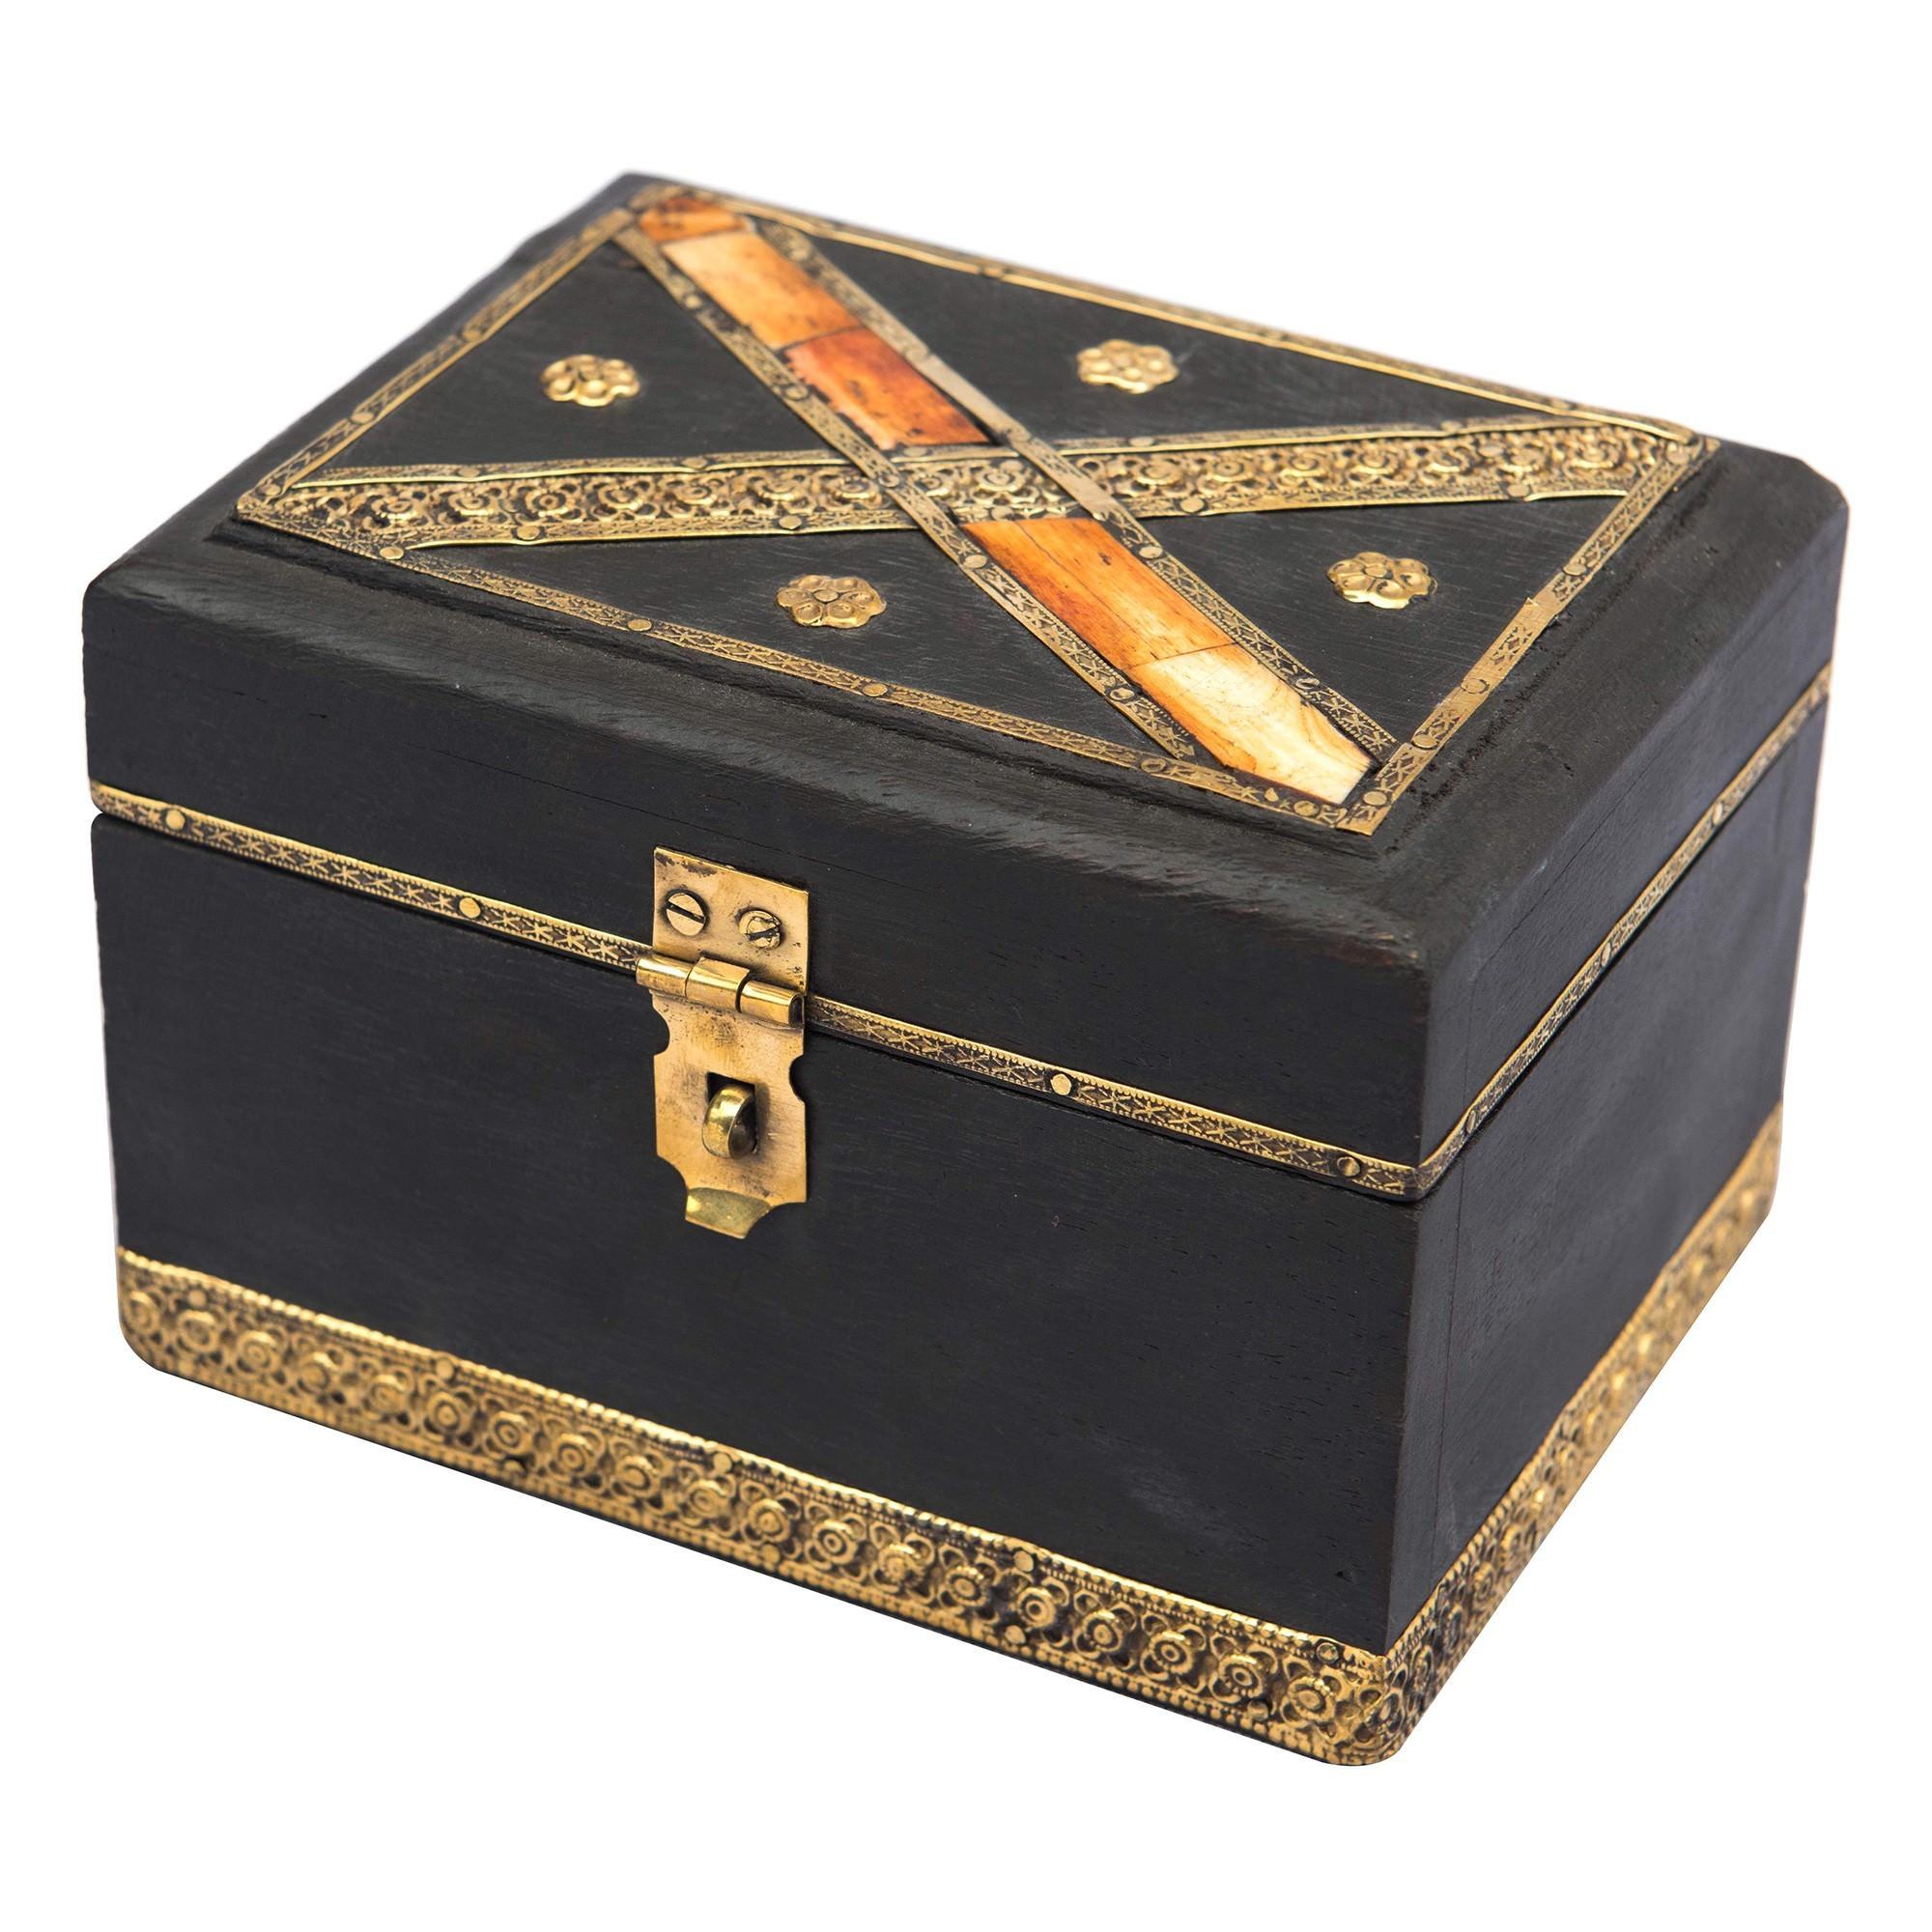 Bora Brass & Bone Inlay Timber Storage Box